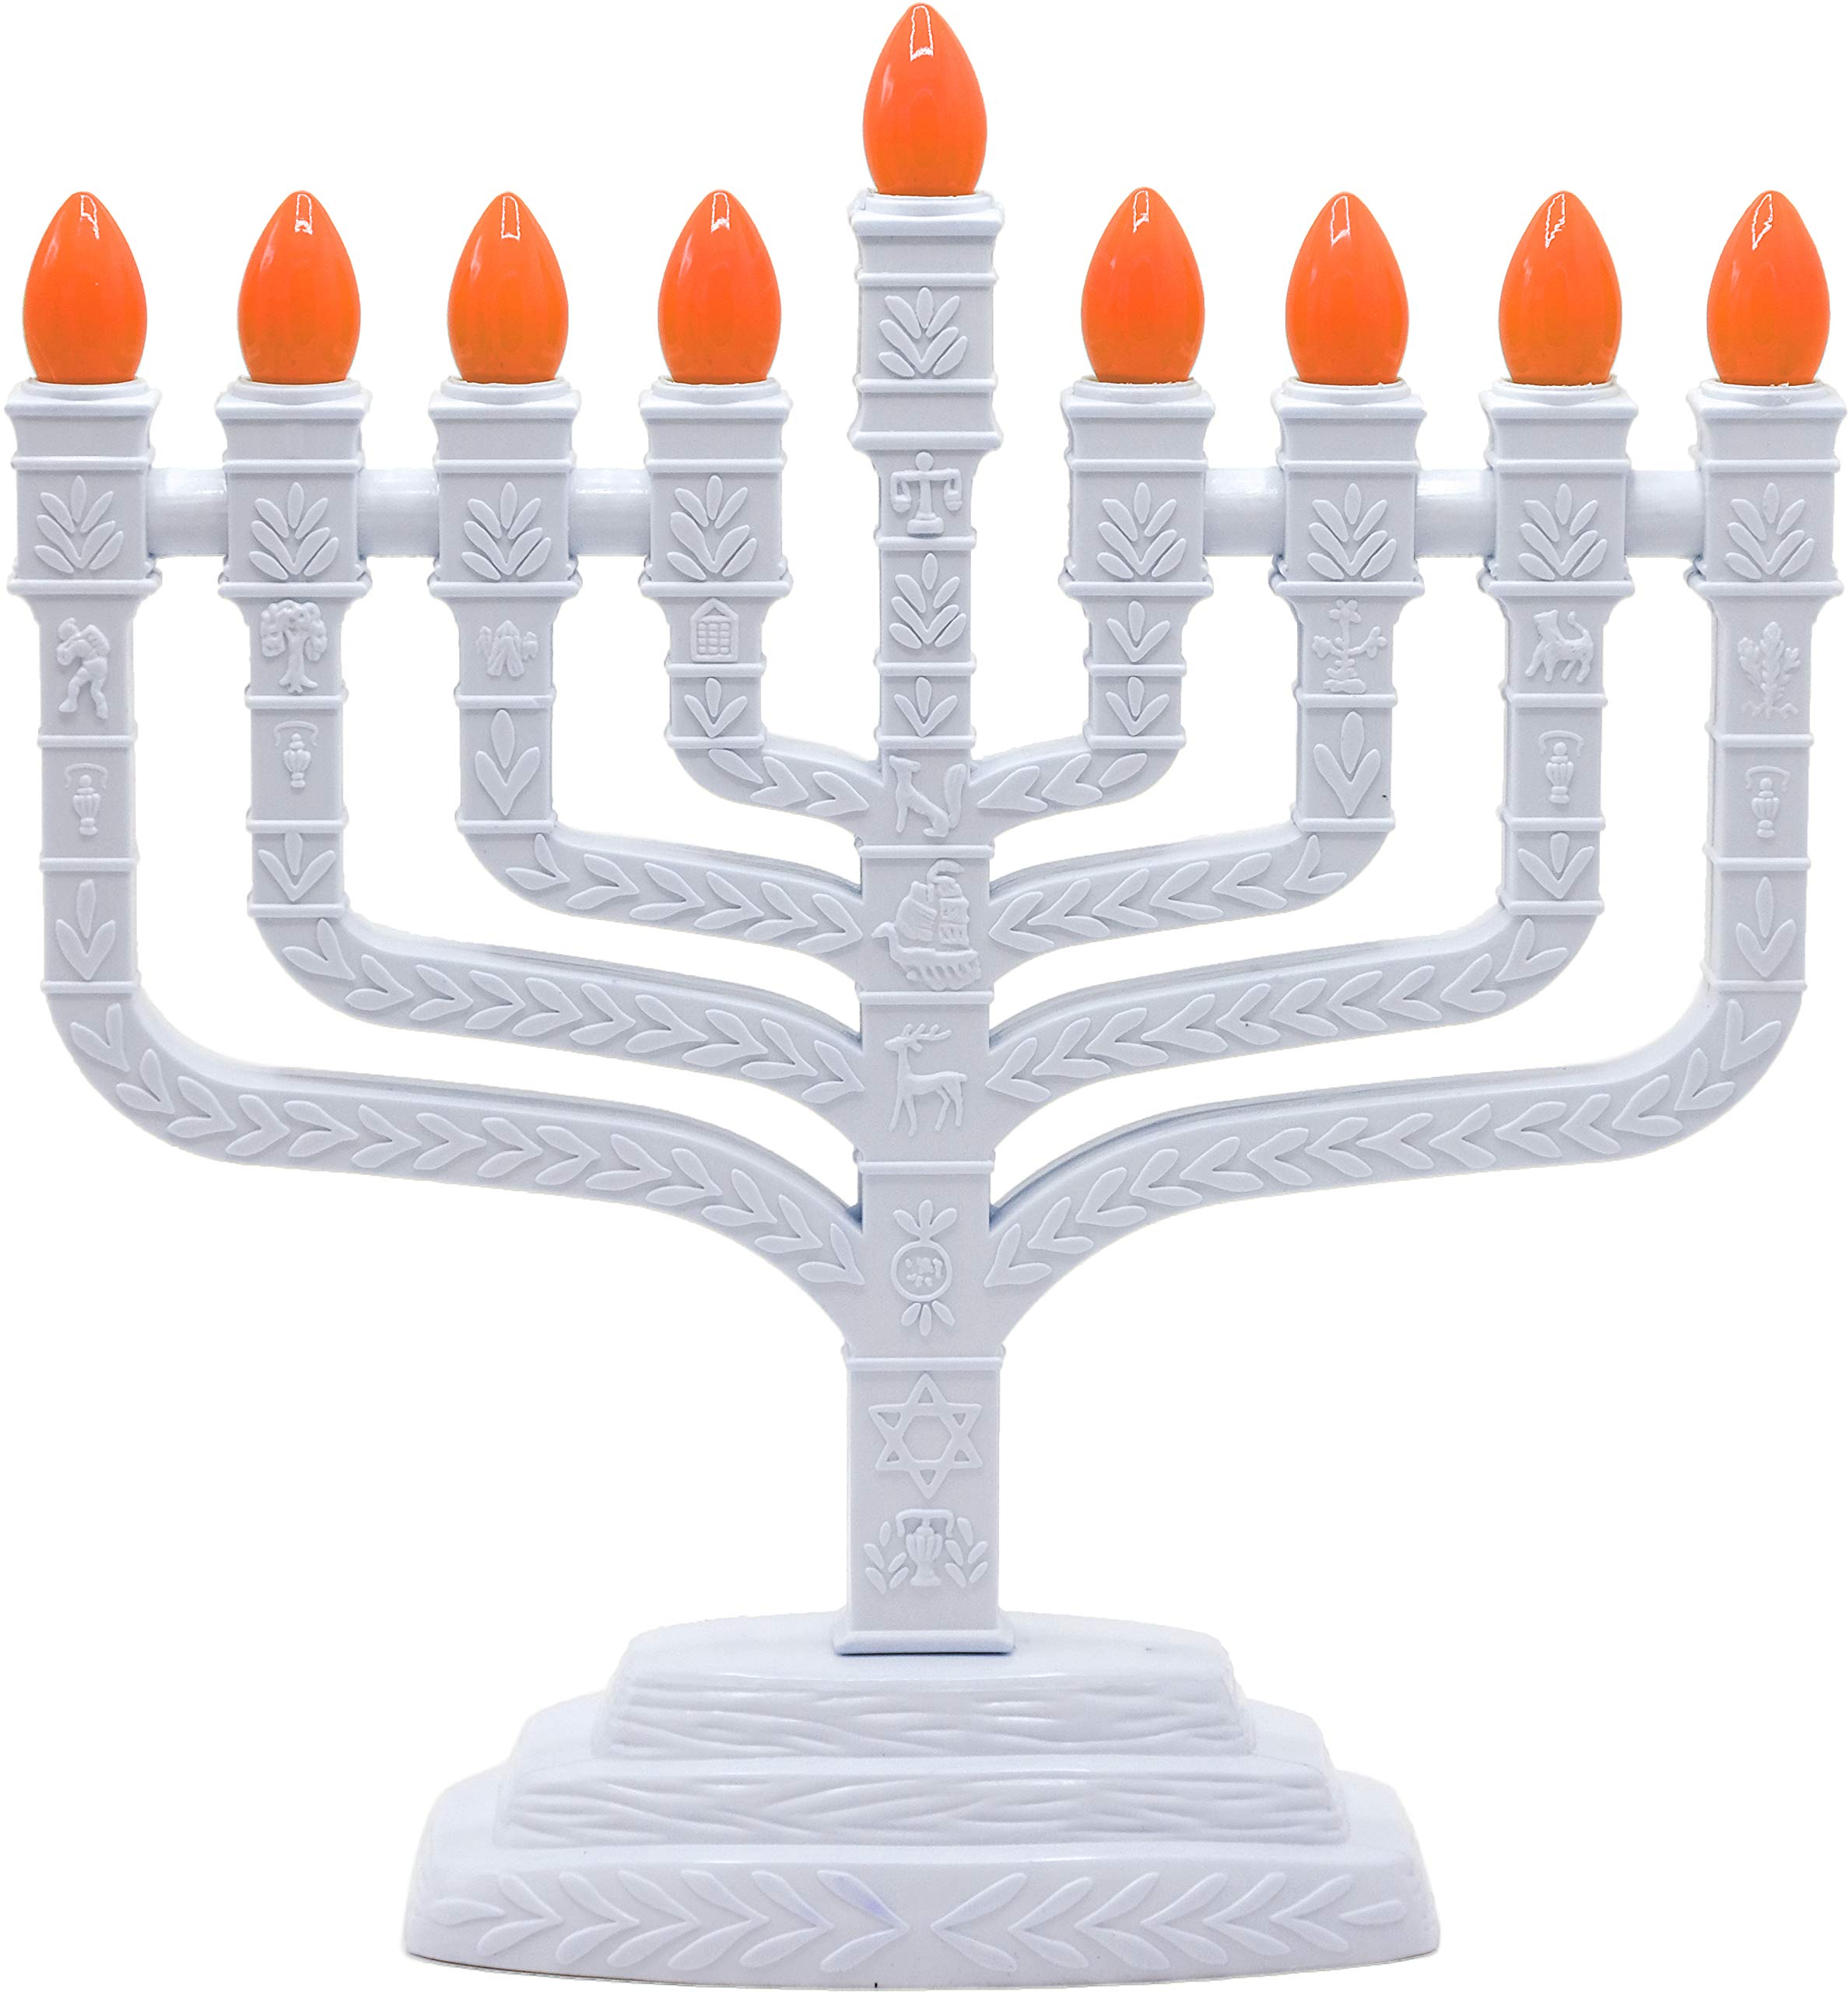 Aviv Judaica PRL-850 White Electric Knesset Menorah with The Symbols of The Twelve Tribes, Gray by Aviv Judaica